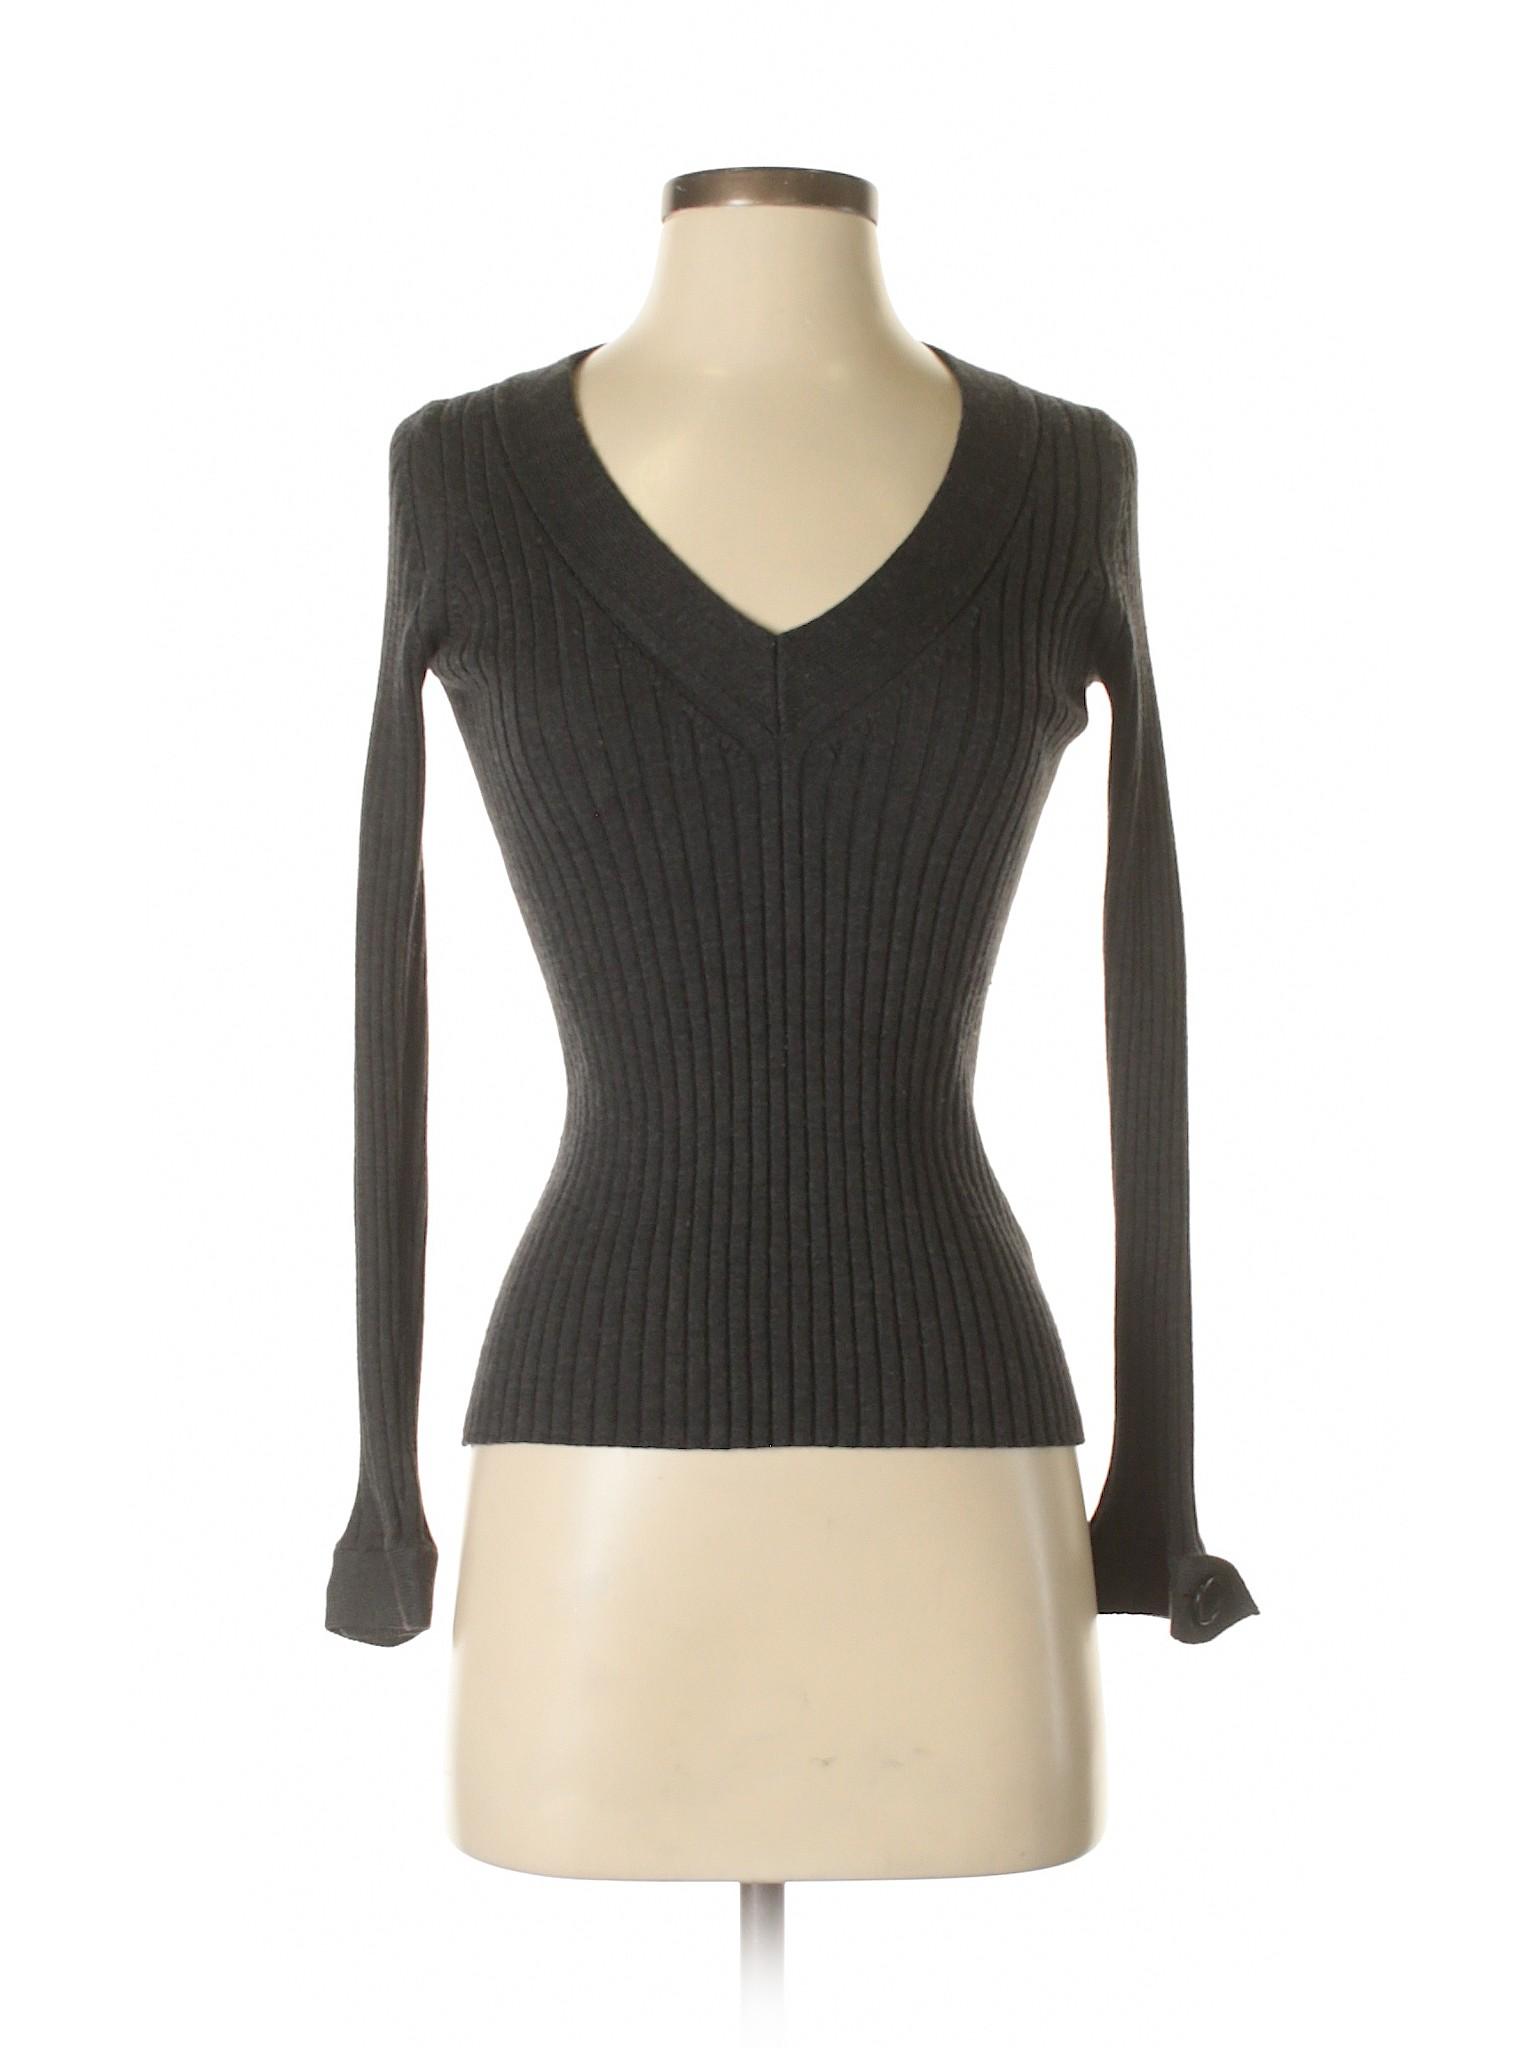 Sweater Banana Pullover Wool Republic Boutique wPZqRax